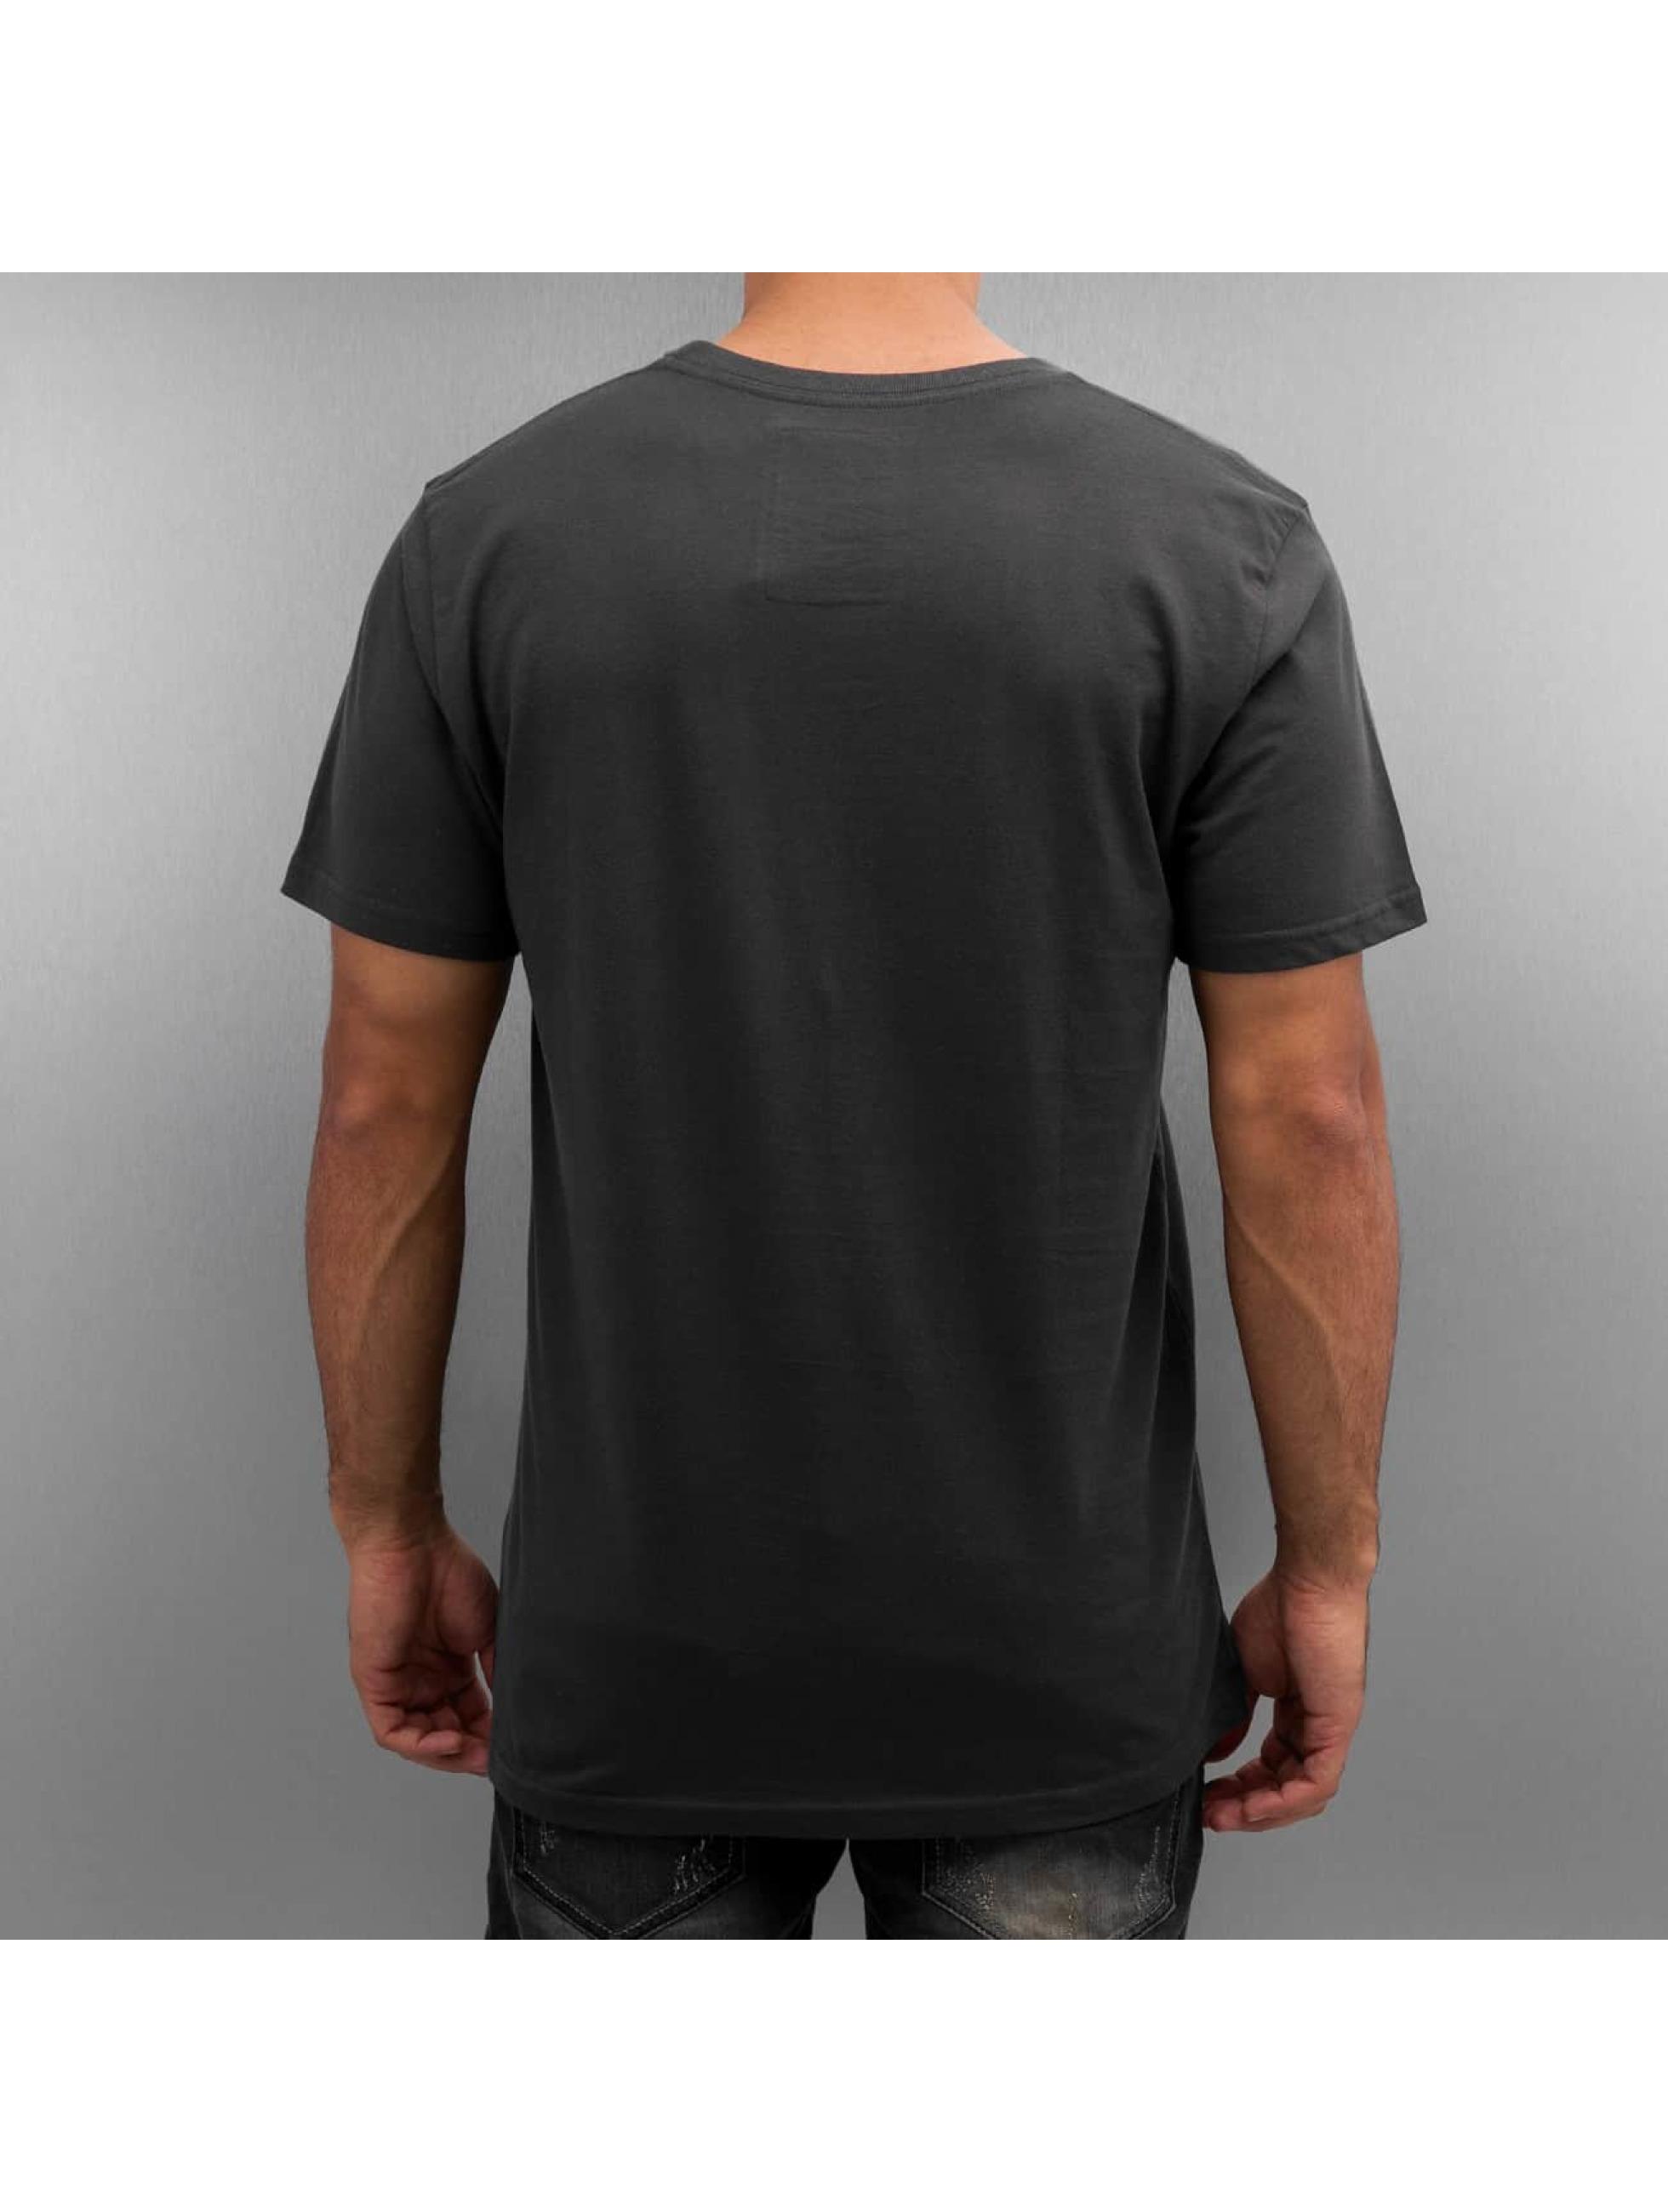 DEDICATED t-shirt Atinum Wish You Were Here grijs